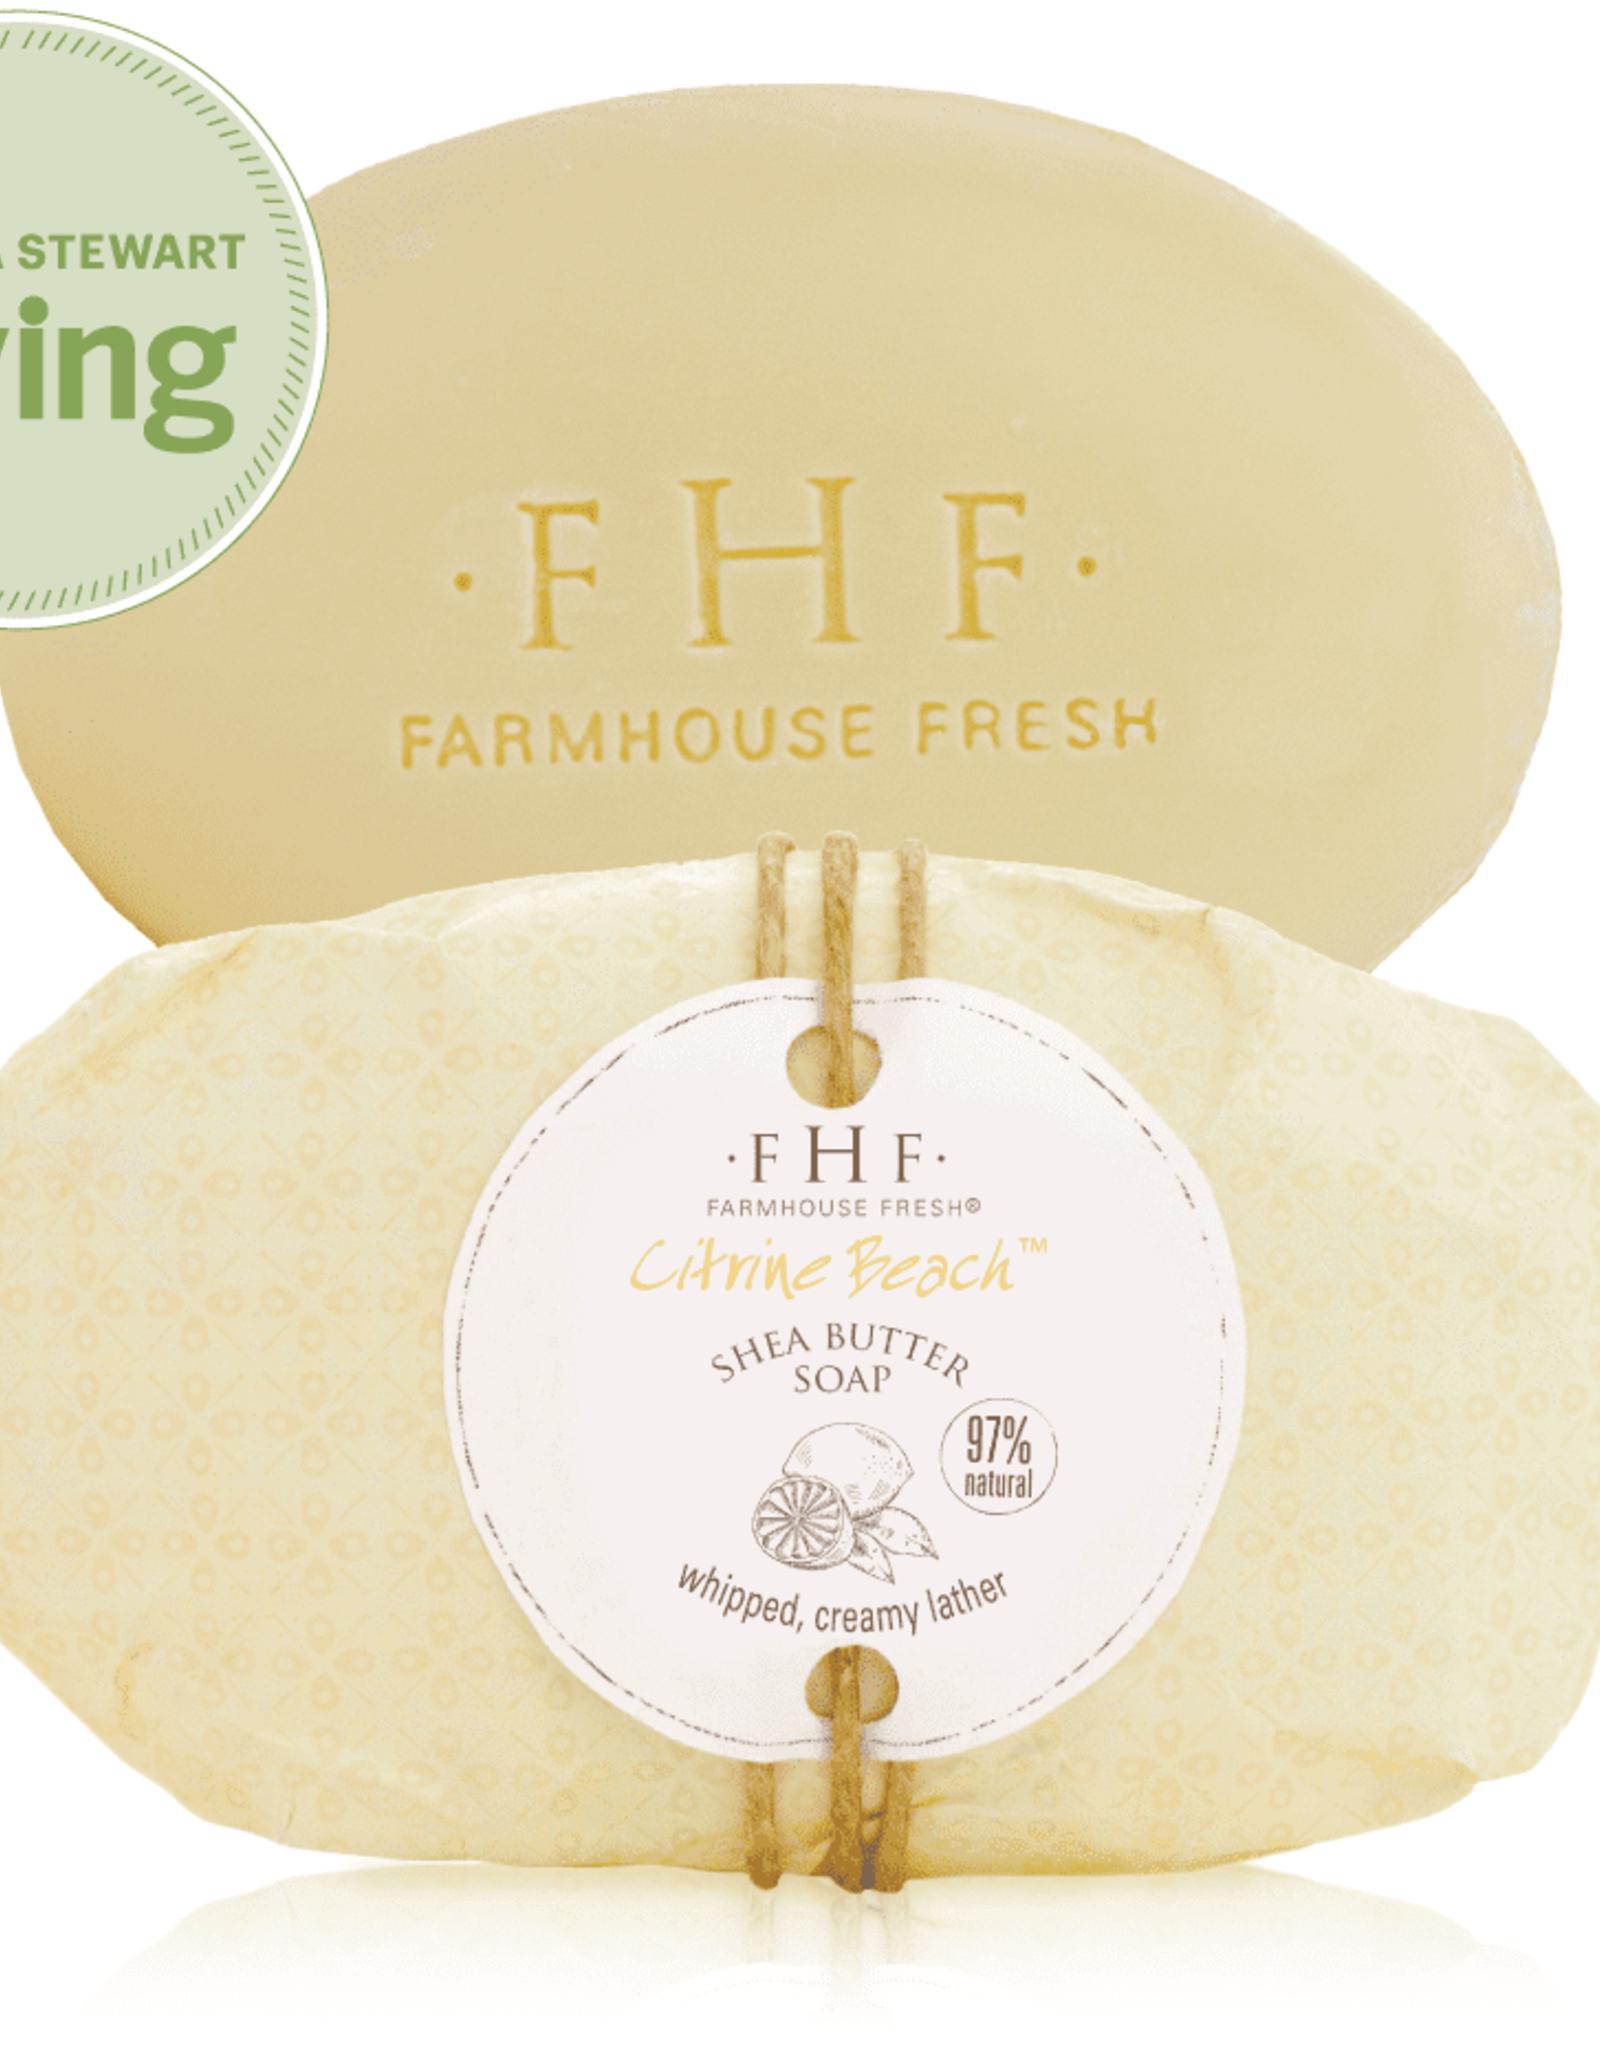 Farmhouse Fresh Shea Butter Soap